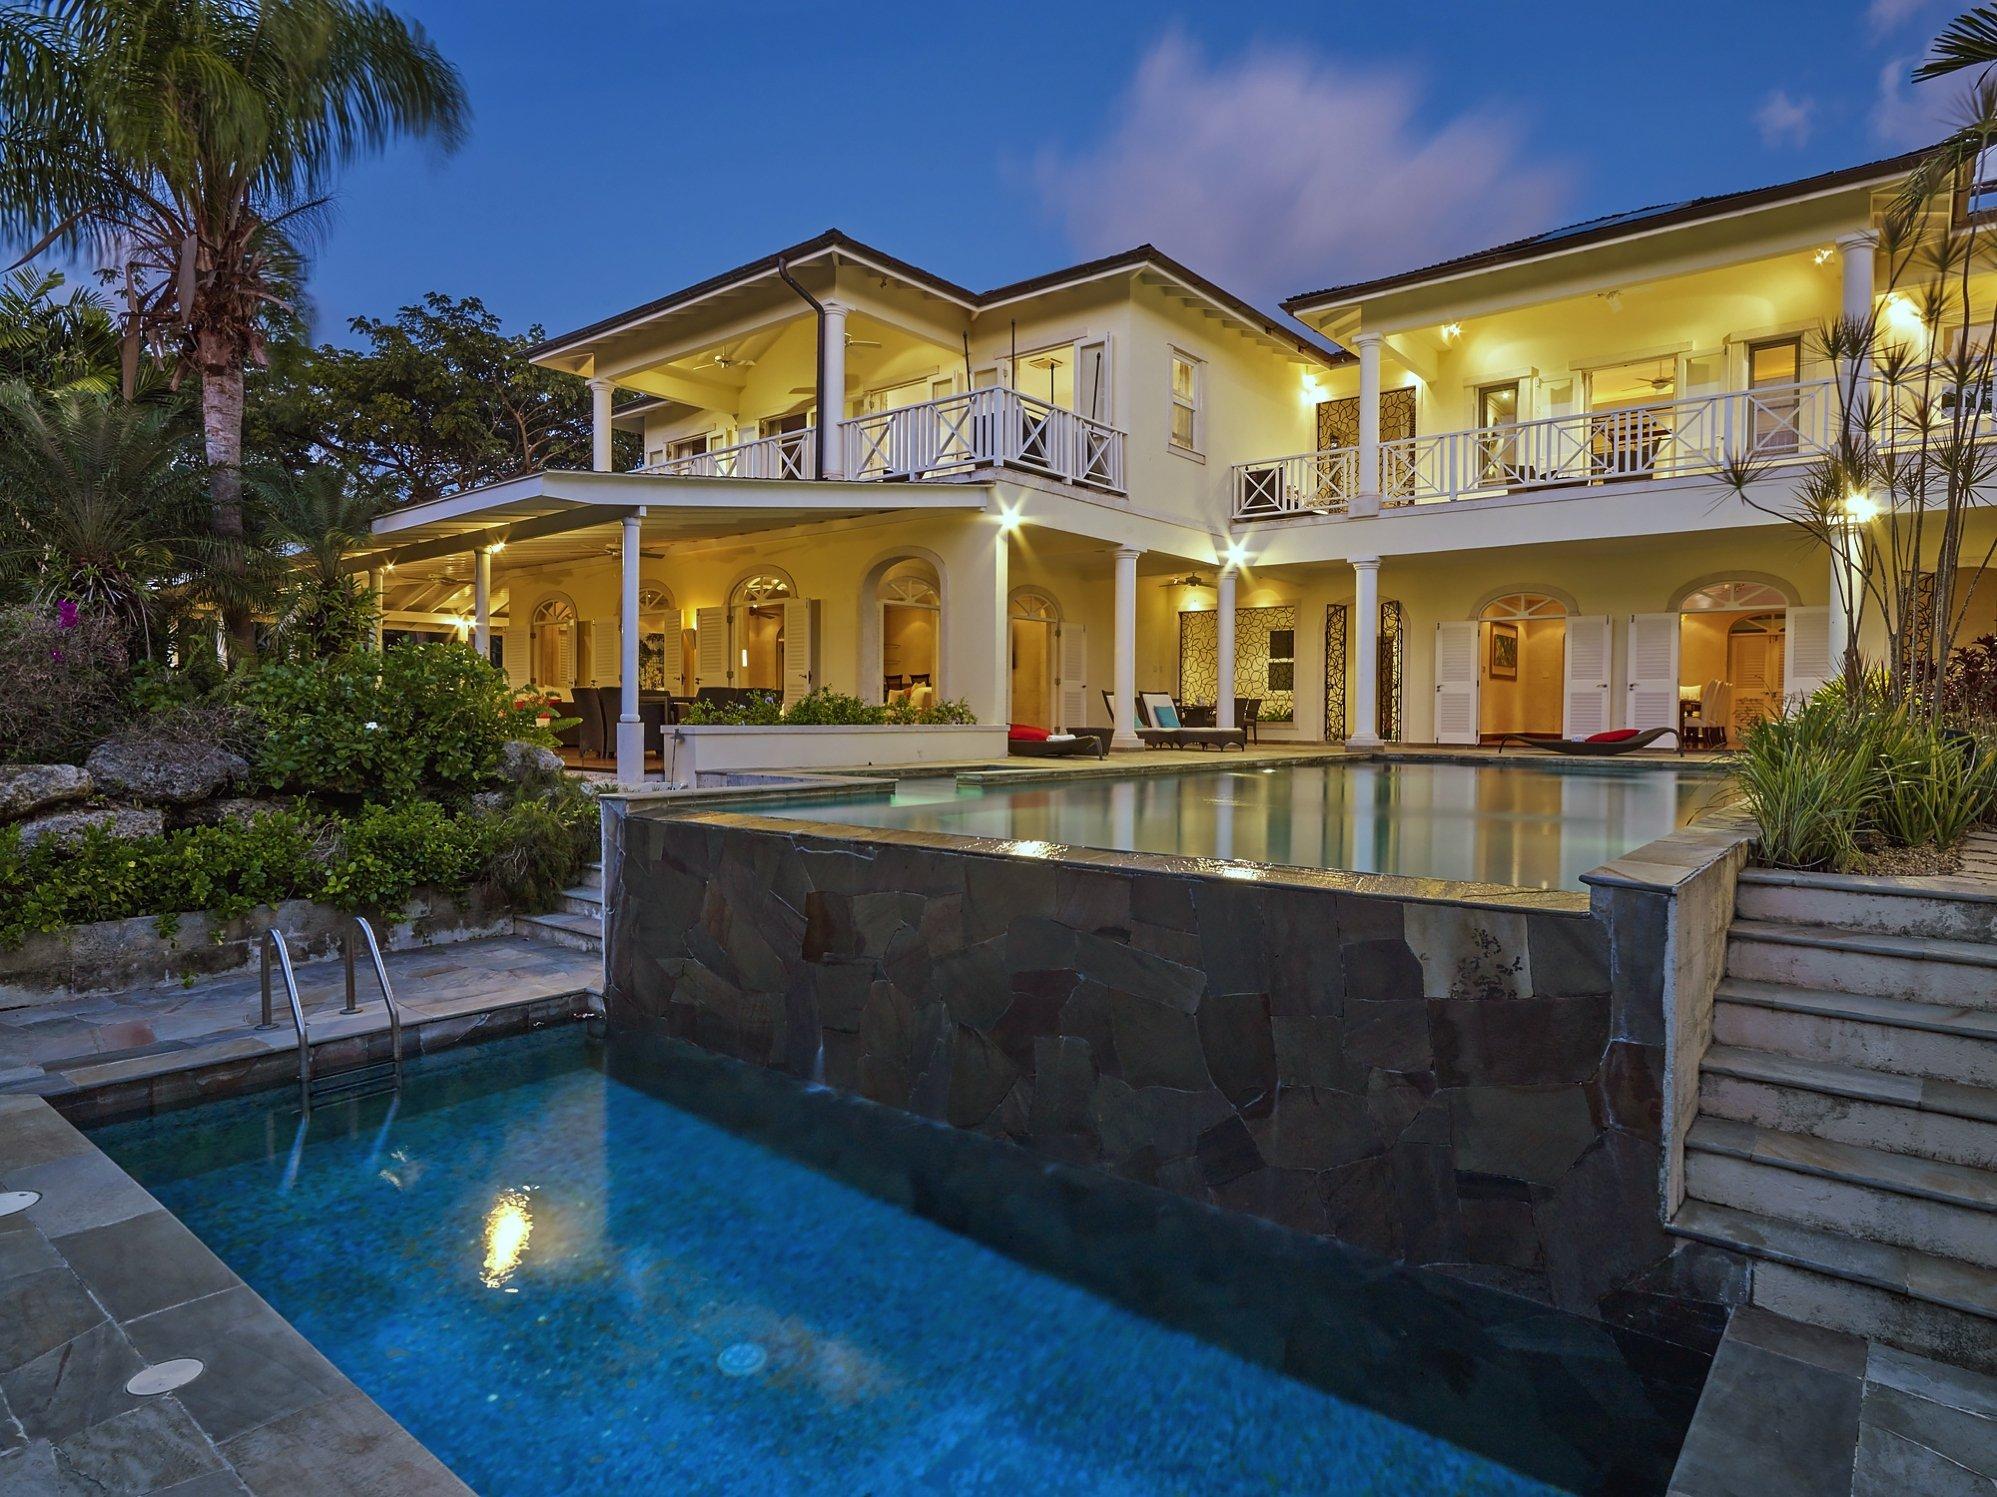 Pool at night Westland Heights Barbados